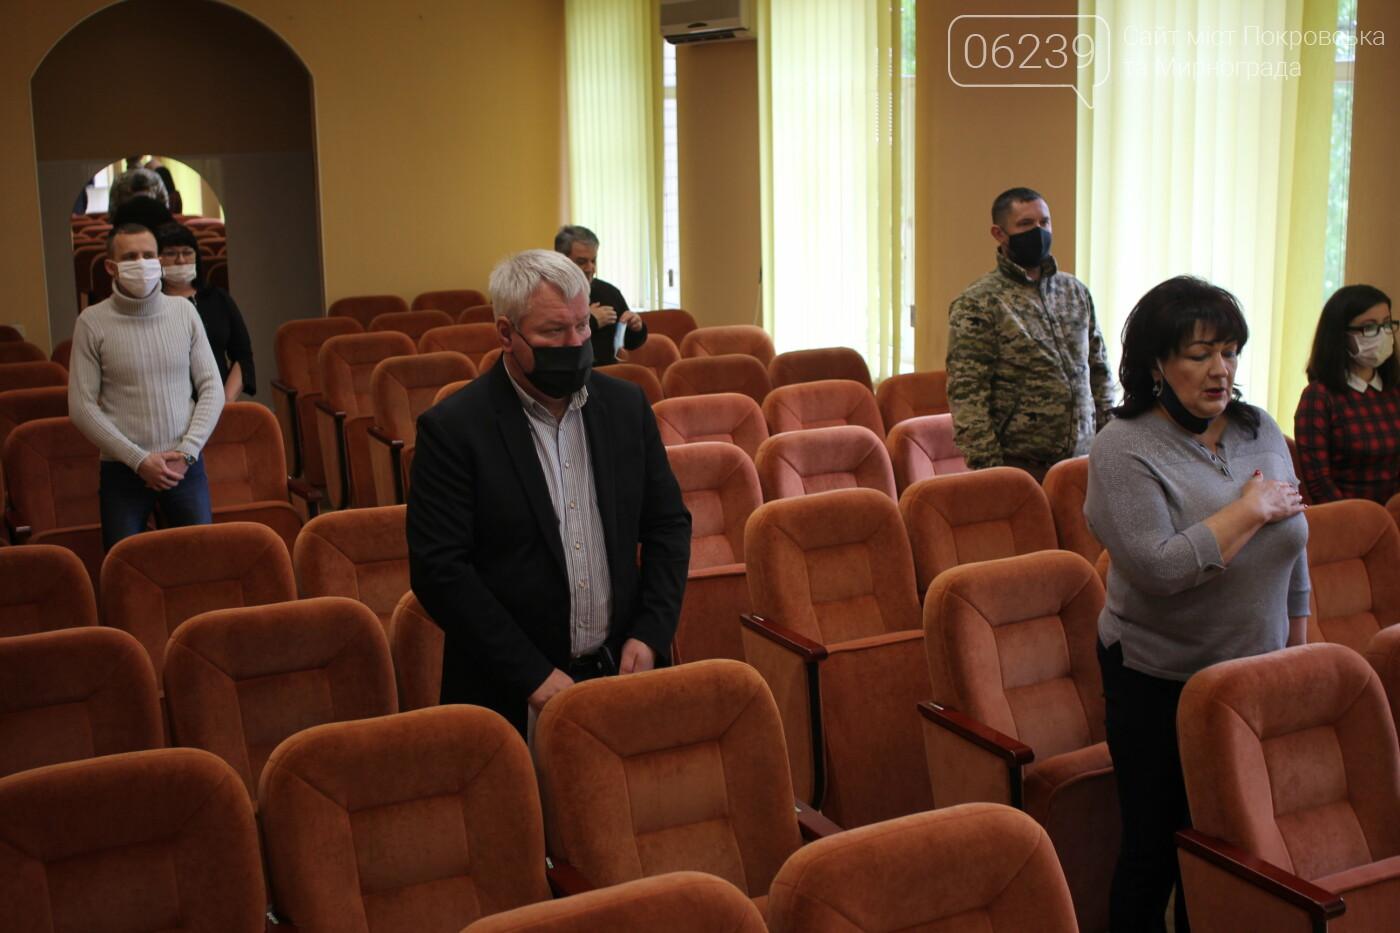 В Мирнограде сессия горсовета снова проходила в онлайн-режиме (вопросы повестки дня), фото-3